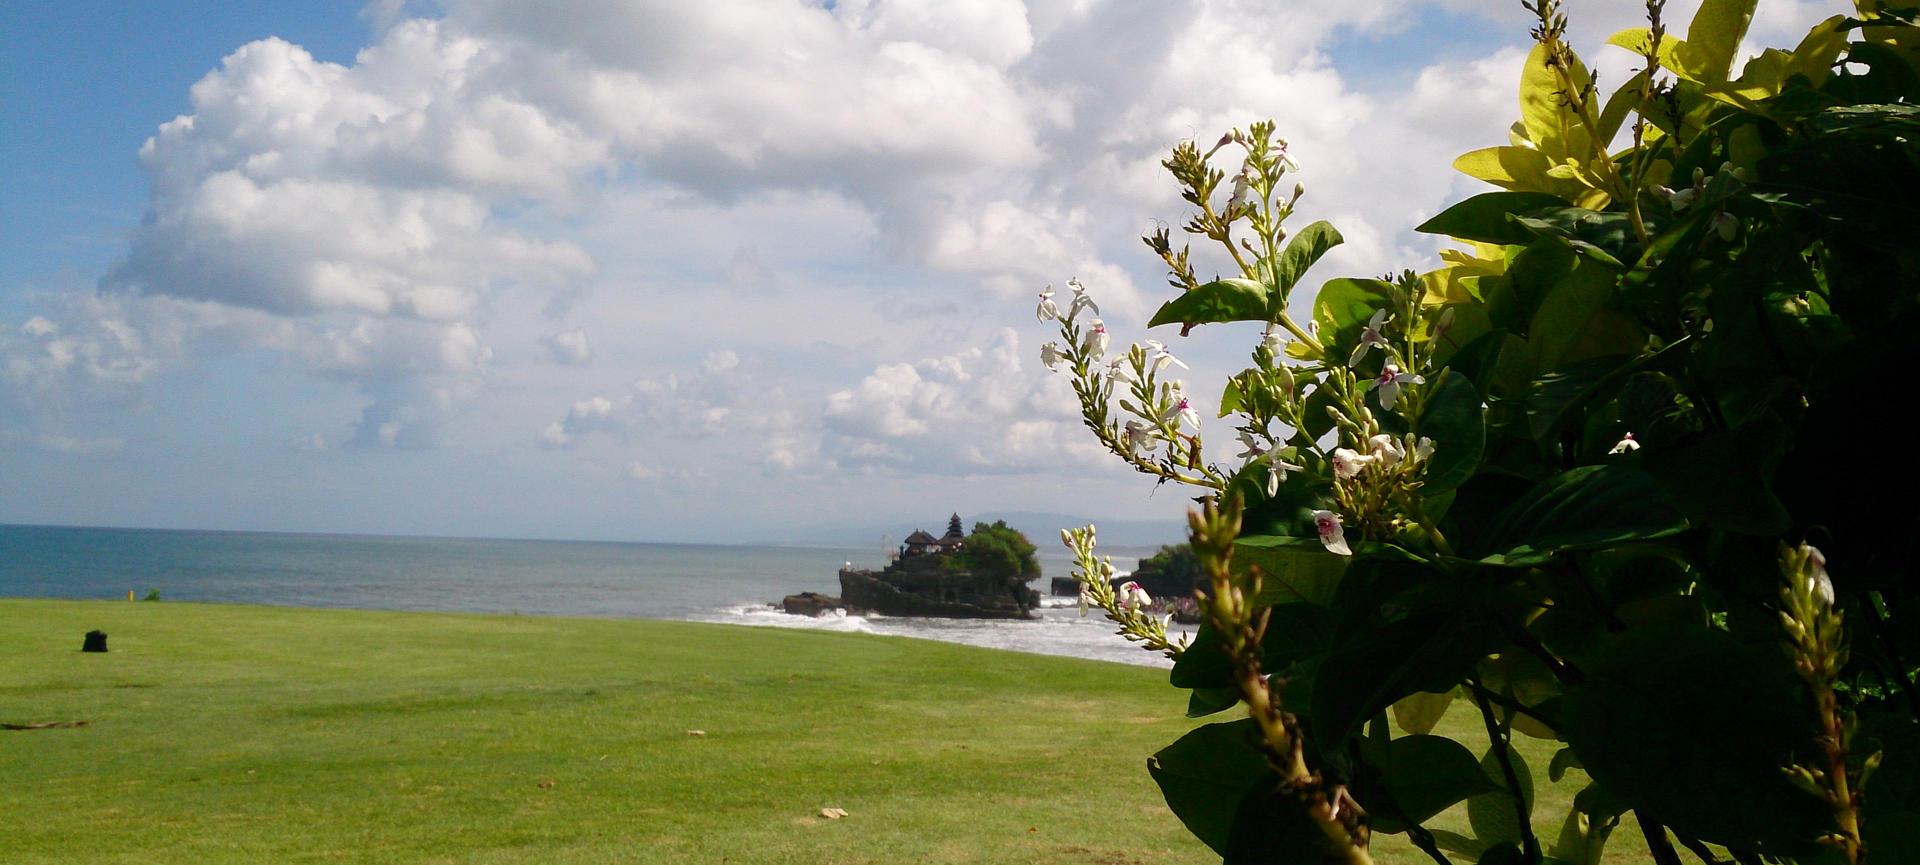 Top 10 Spots To Enjoy Balinese Sunshine